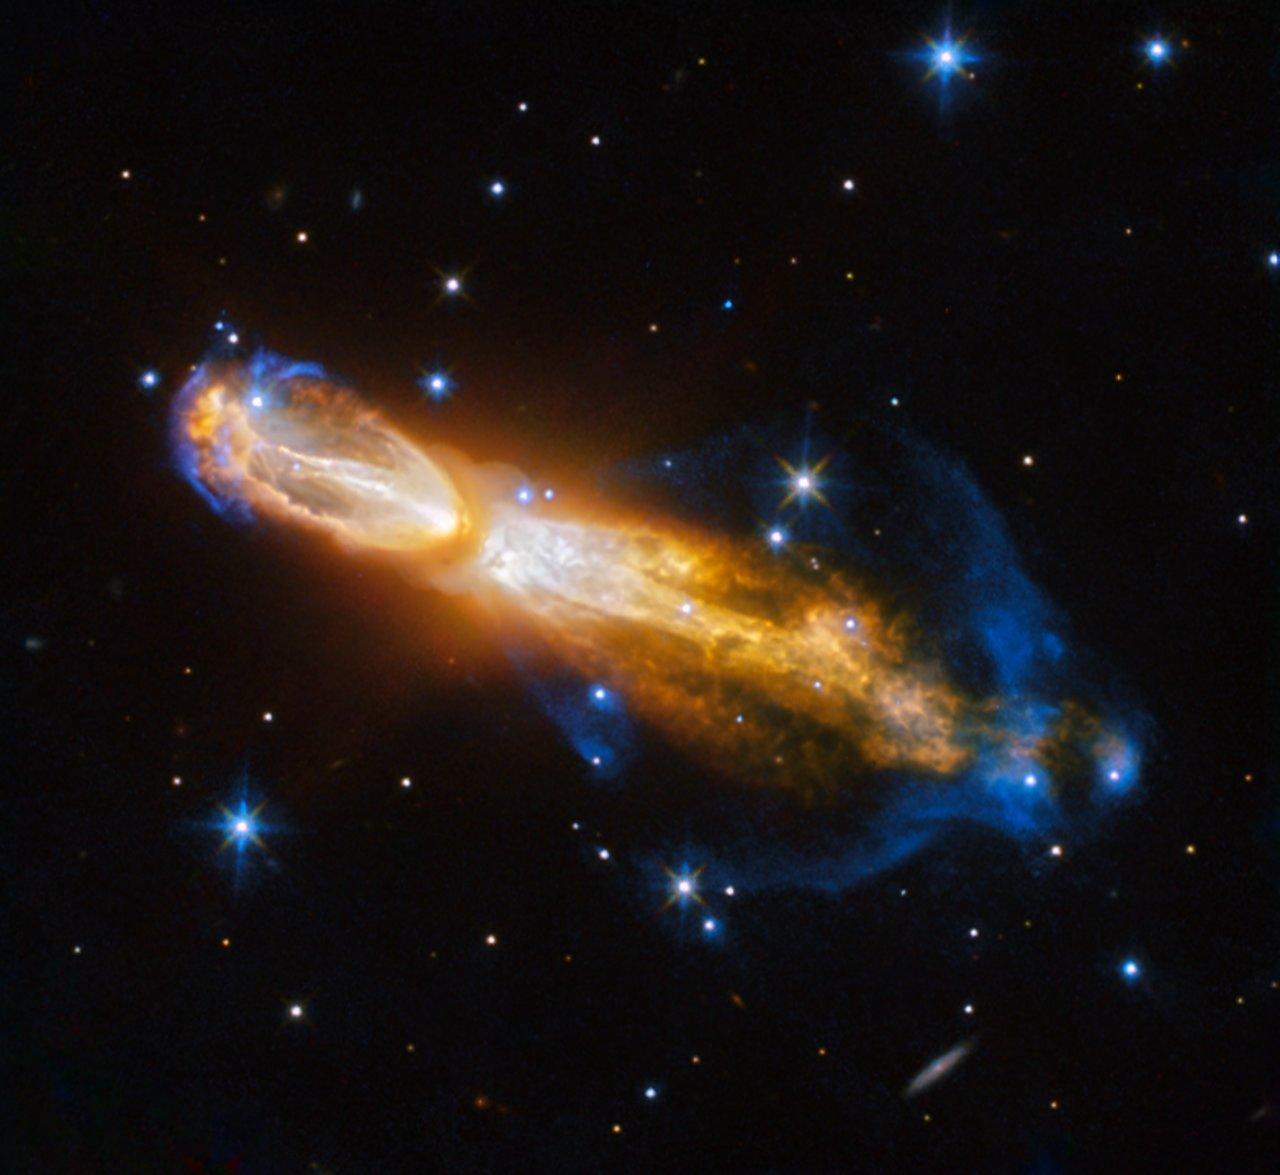 Telescopio Hubble captura la inquietante muerte de la «nebulosa del Huevo Podrido»